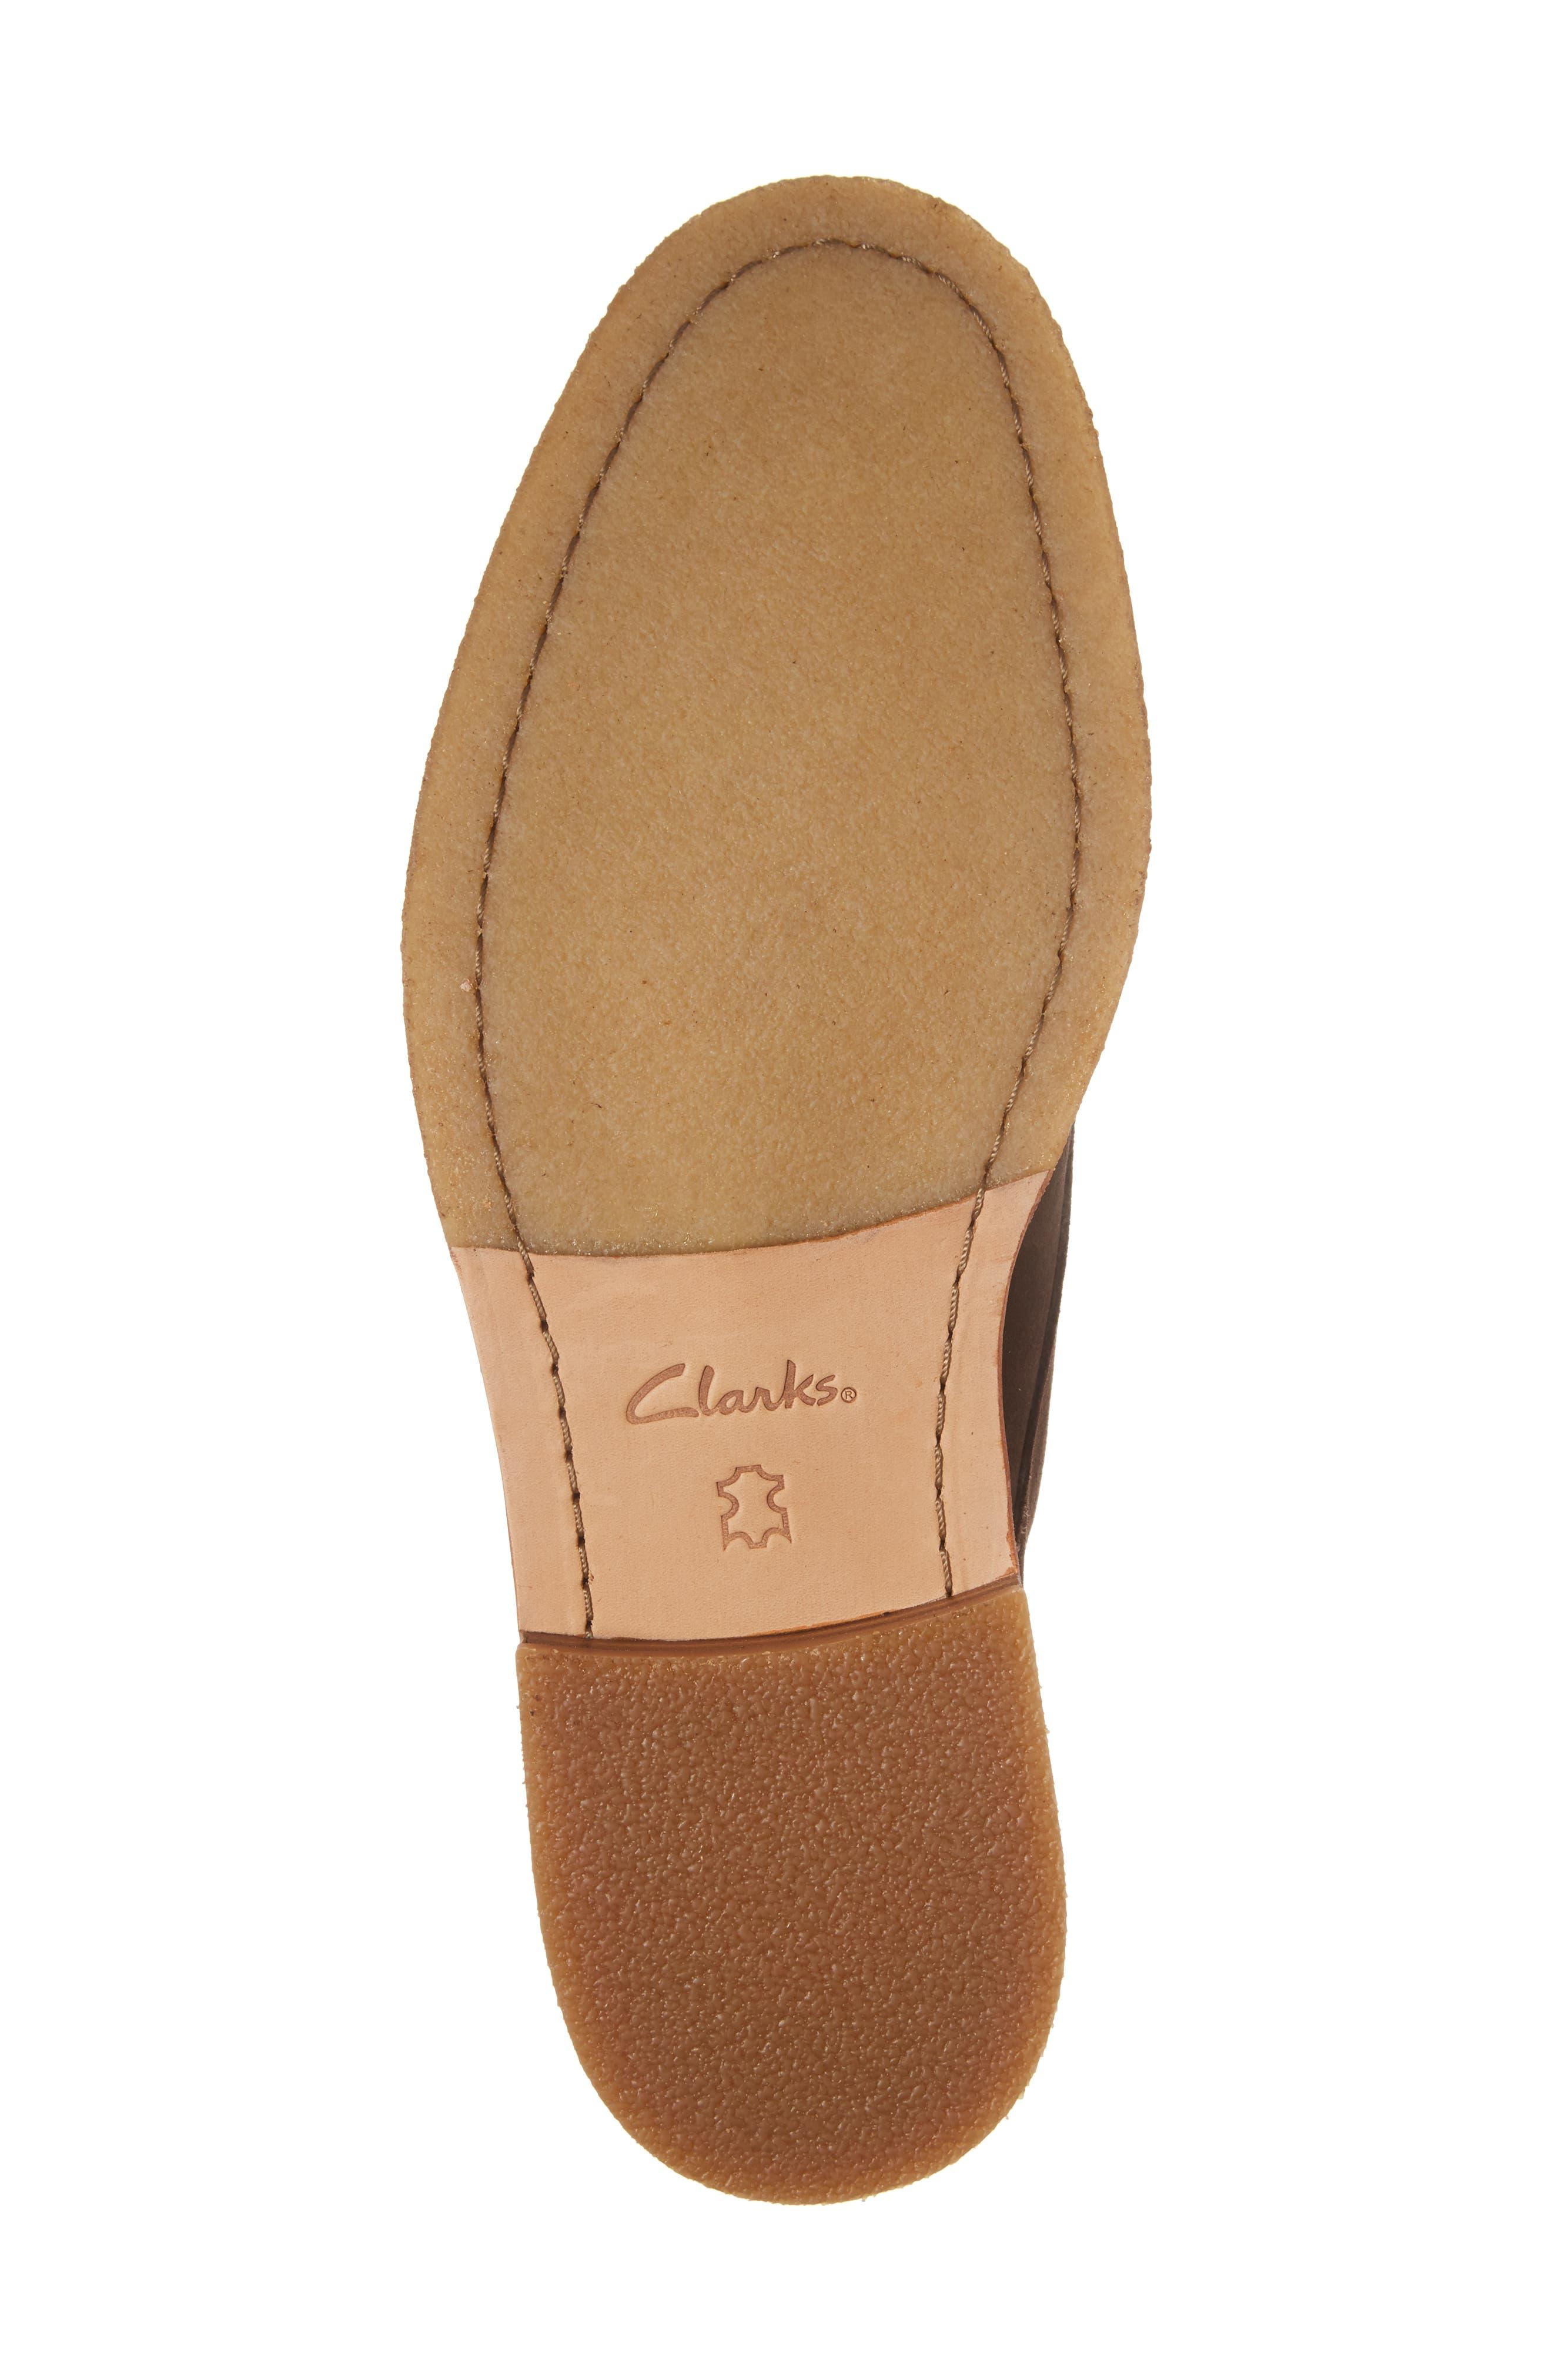 Clarks Clarkdale Moon Buck Shoe,                             Alternate thumbnail 17, color,